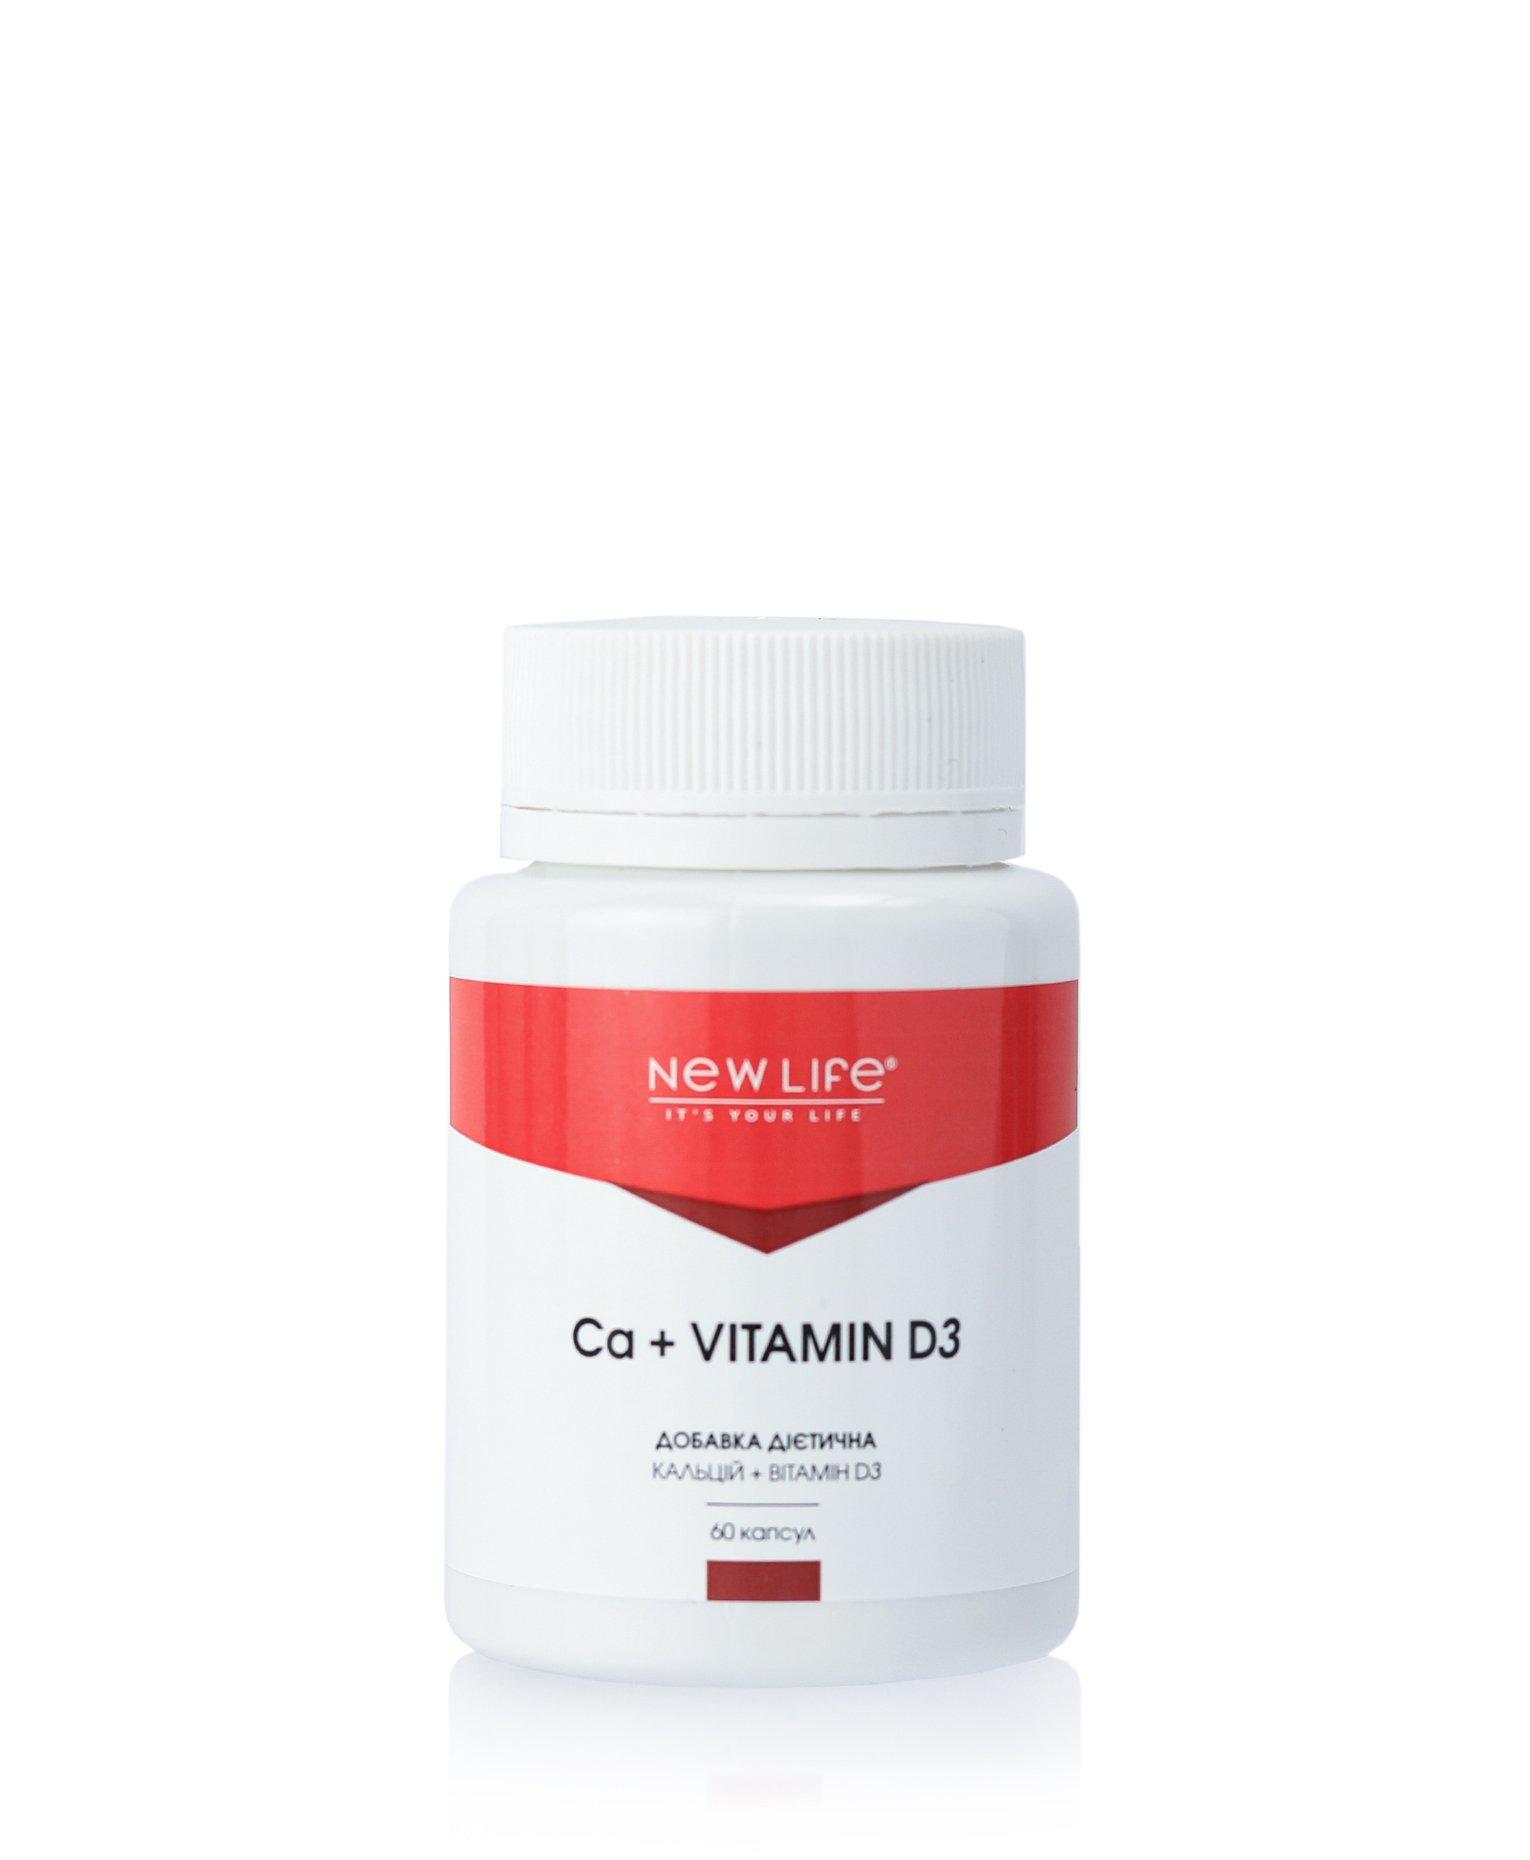 Ca+VITAMIN D3/КАЛЬЦИЙ+ВИТАМИН D3 60 КАПСУЛ В БАНОЧКЕ